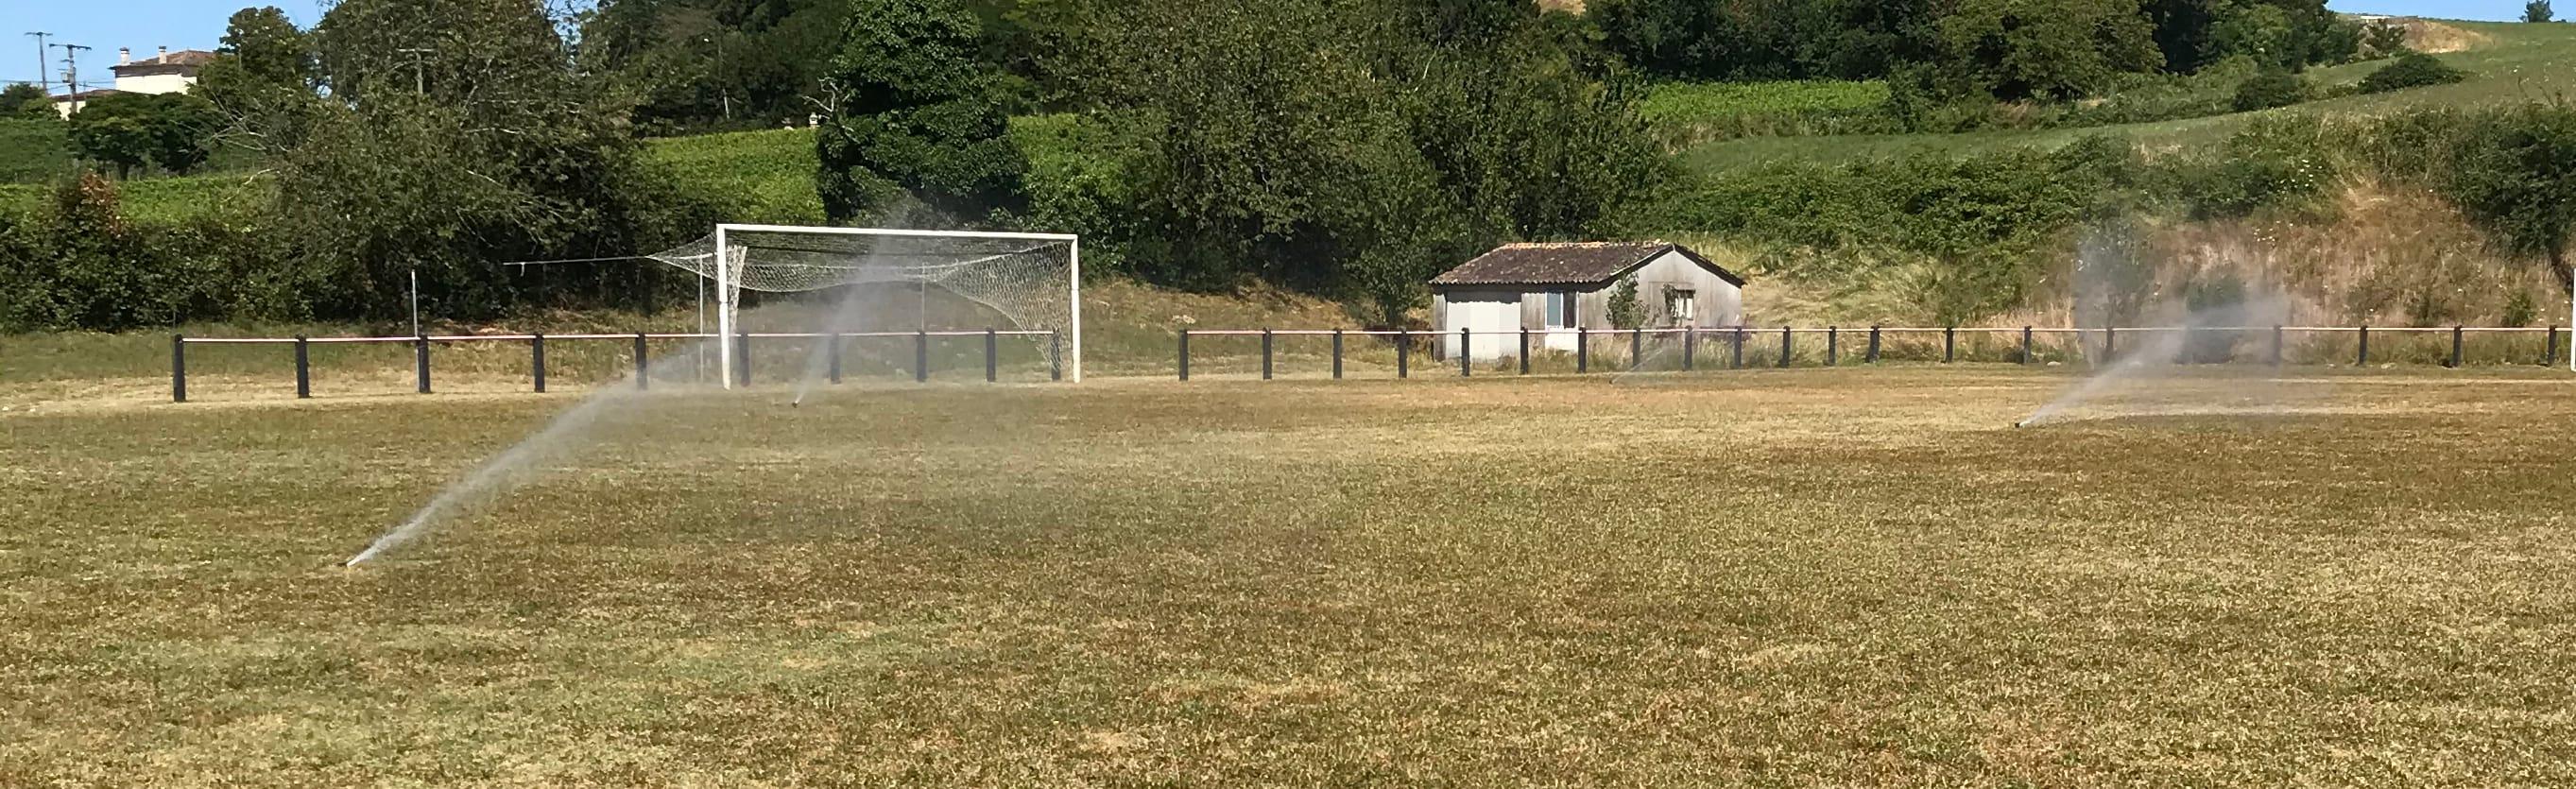 Fronsac FC